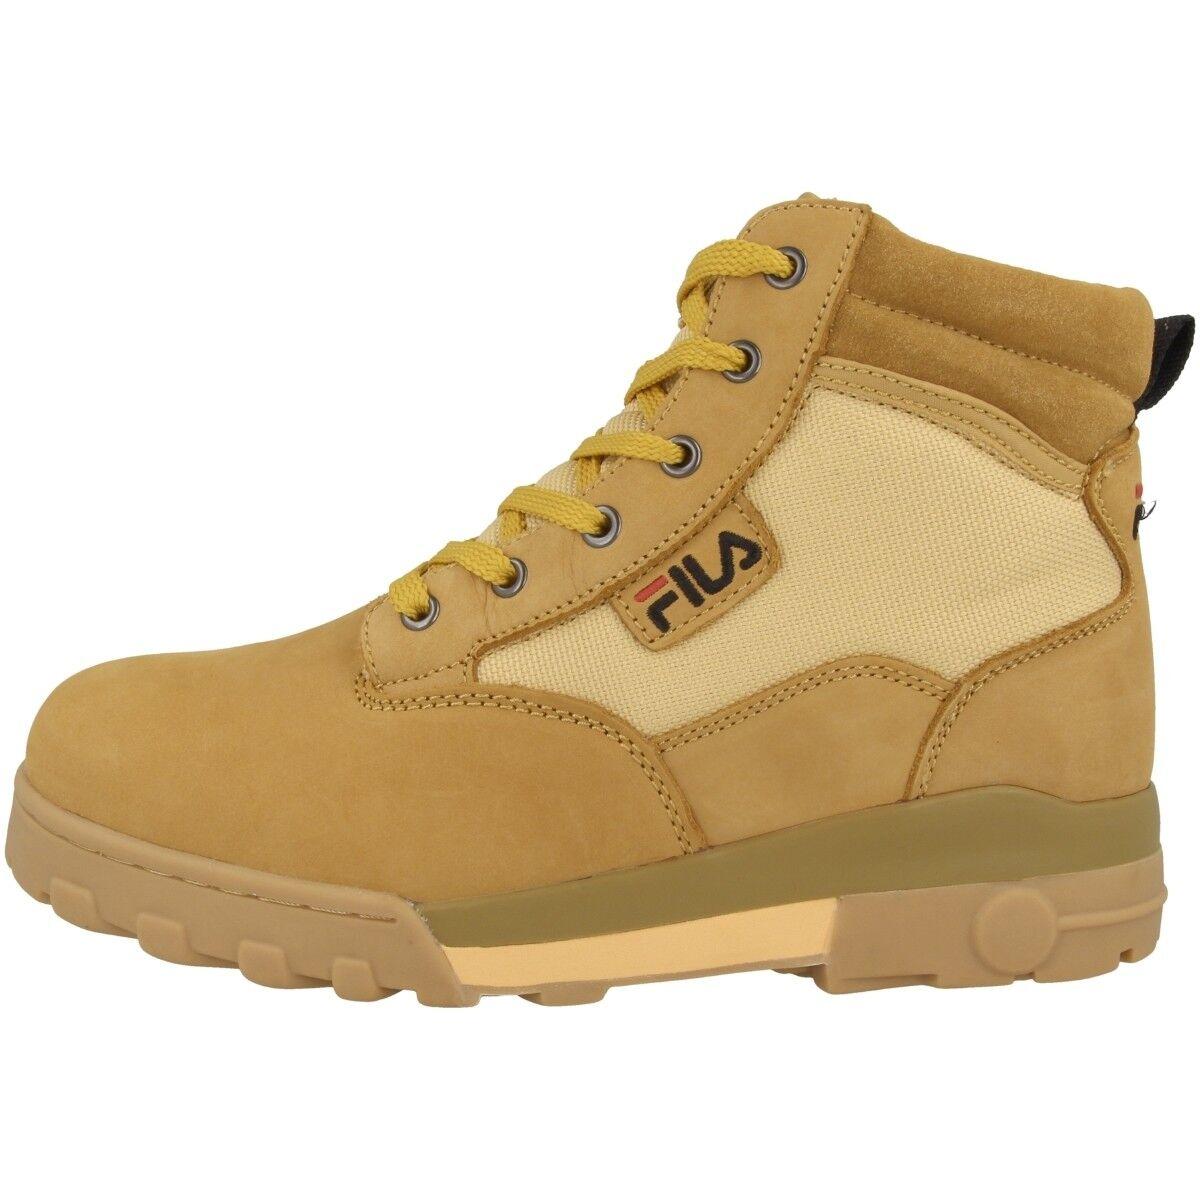 Fila Grunge Mid Zapatos Botas Al Aire Ardilla Libre Excursionismo Ardilla Aire 1010107.EDU f4f70b